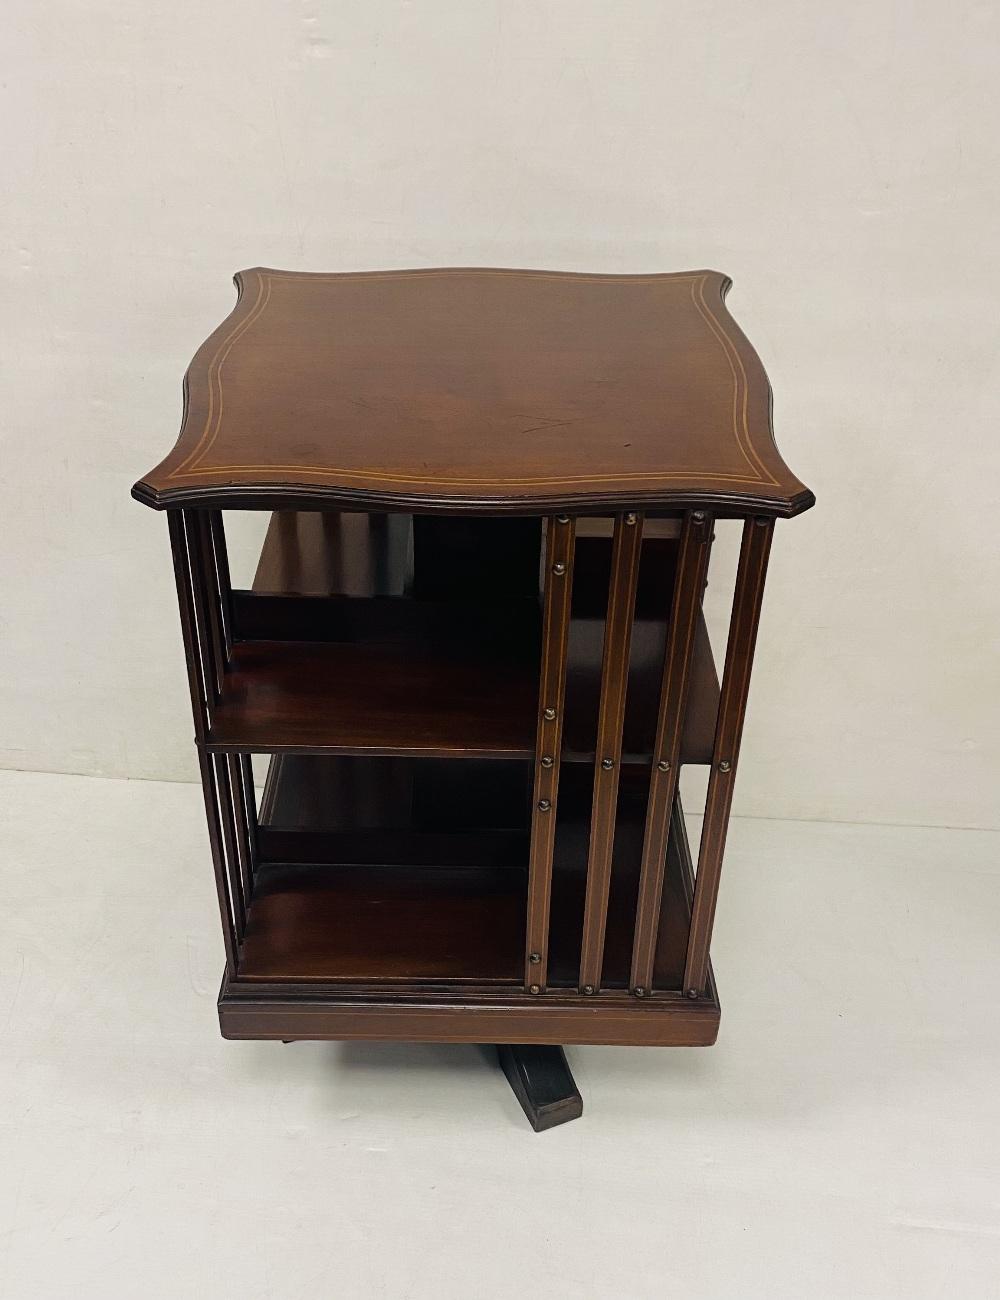 Edw Inlaid Mahogany Revolving Bookcase 52cm Sq x 78cm H